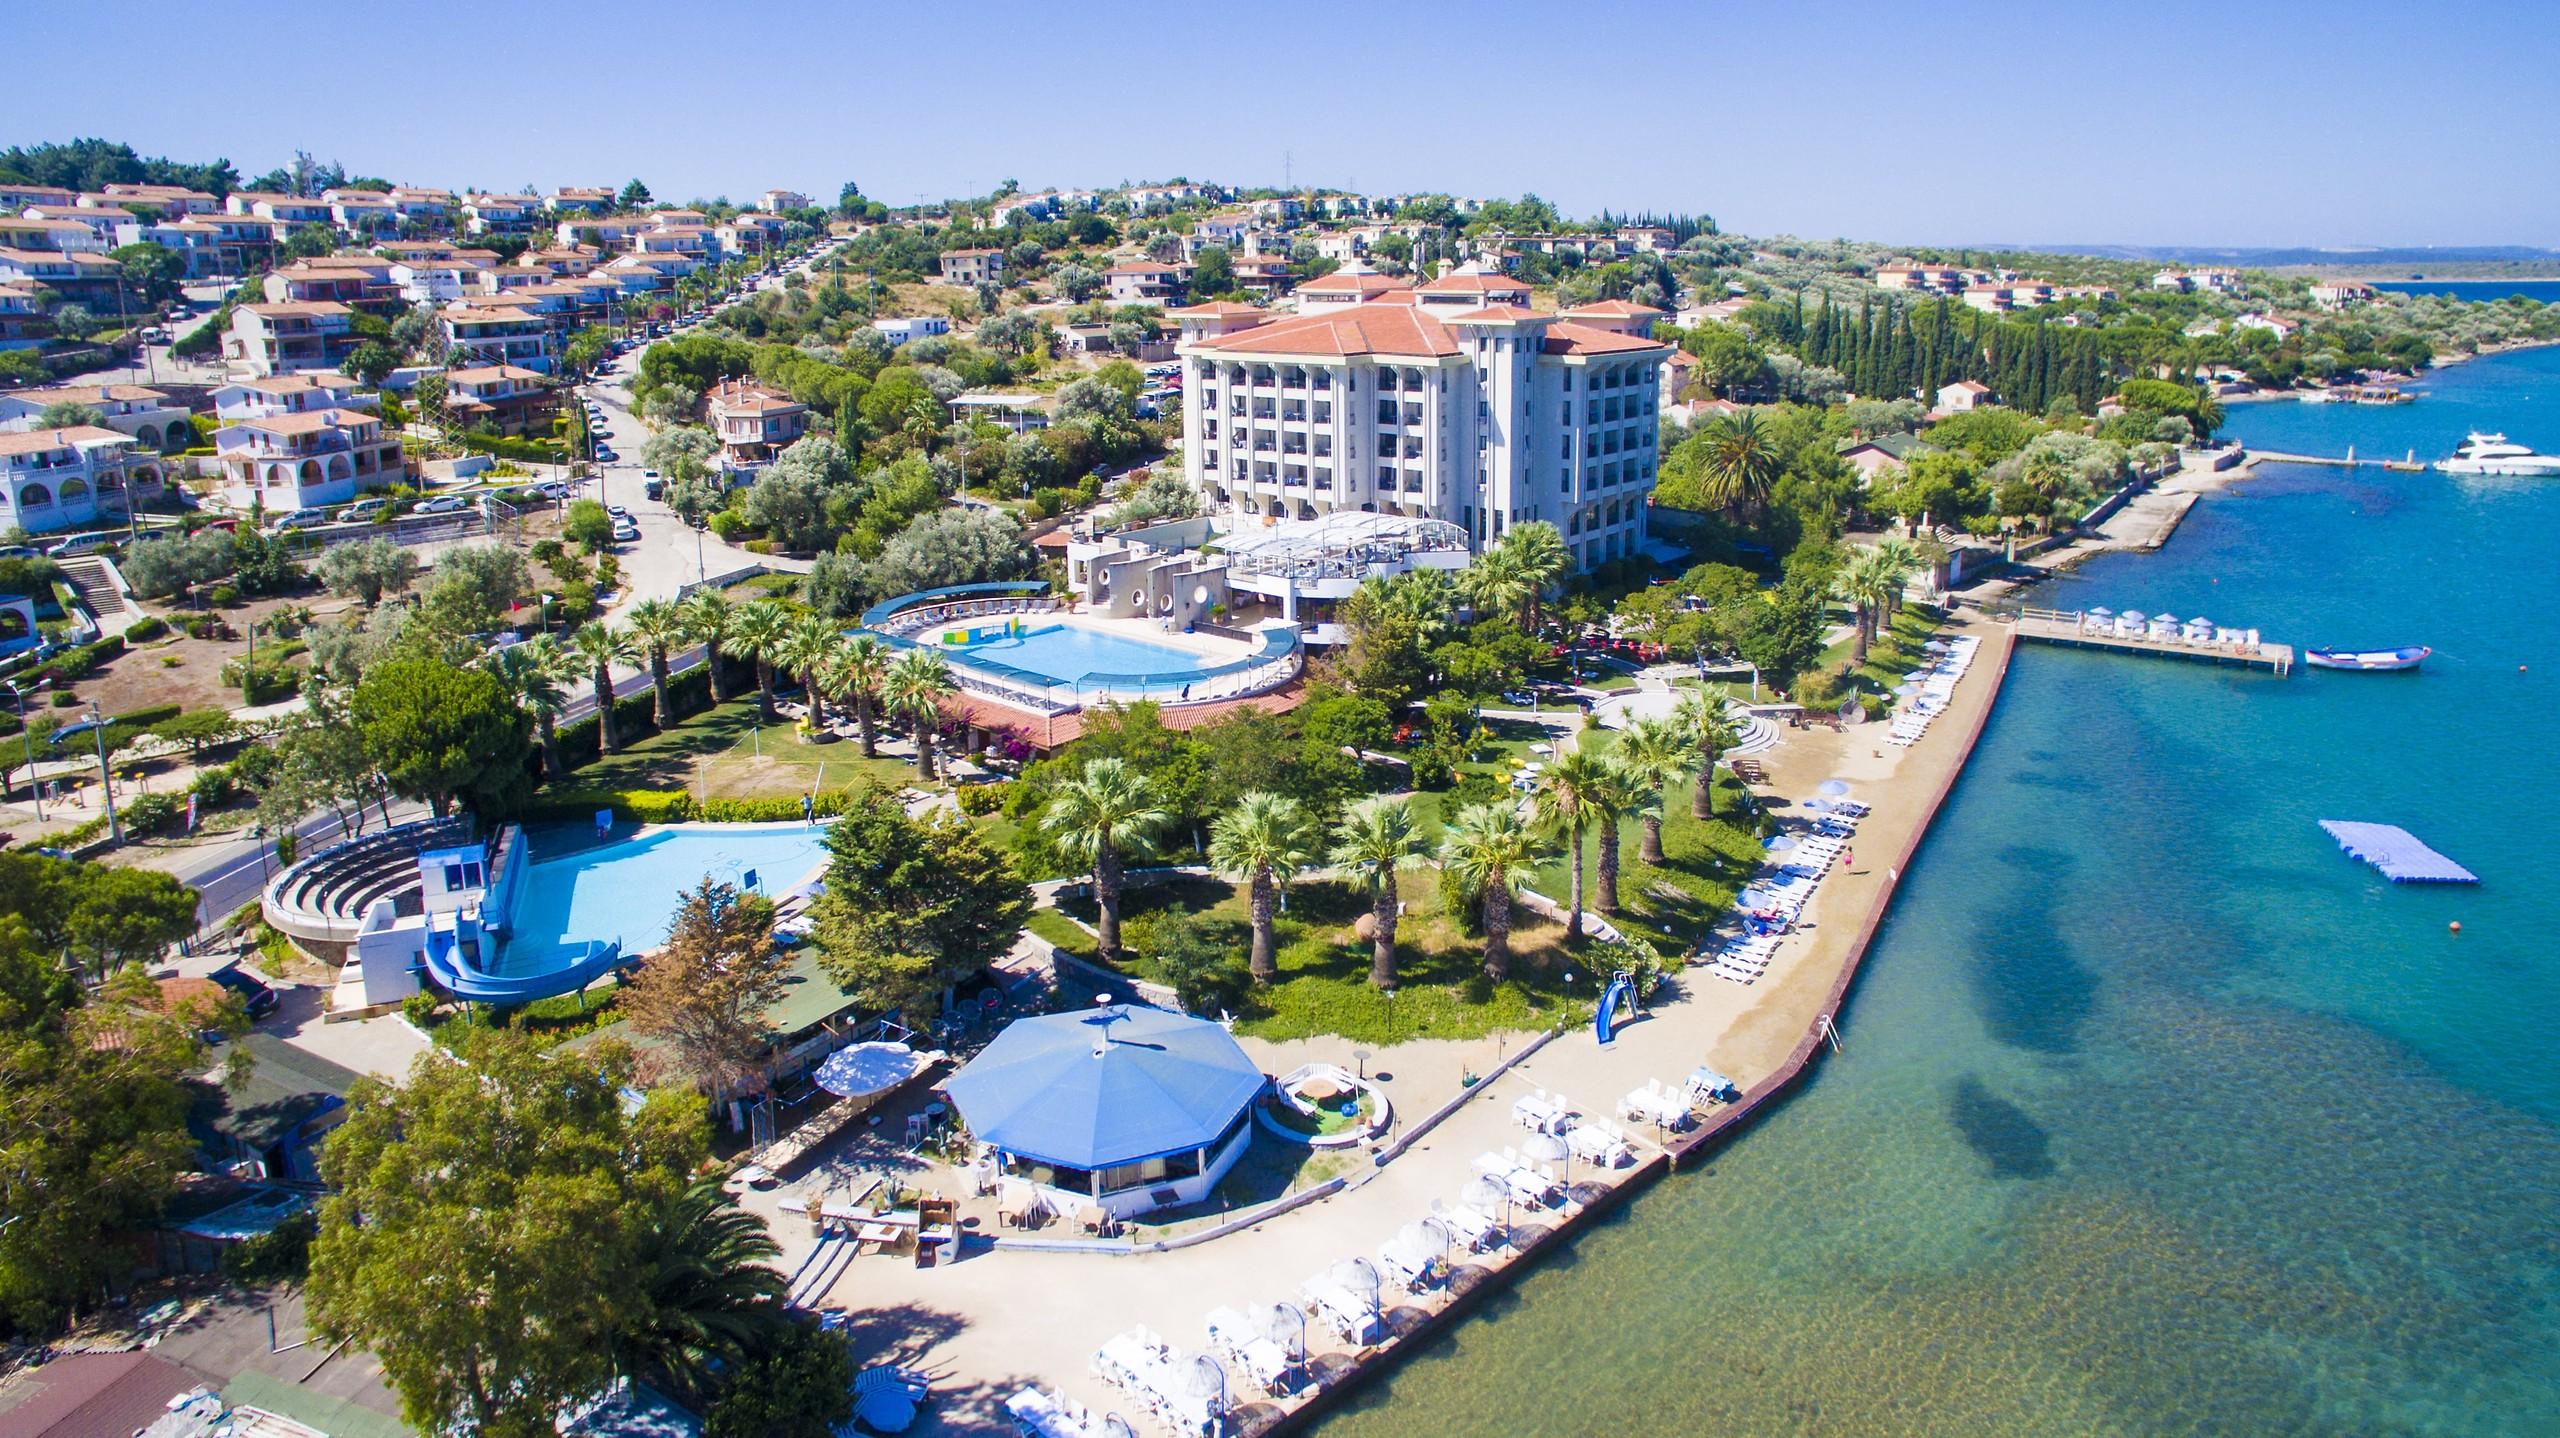 Medis Hotel Çeşme